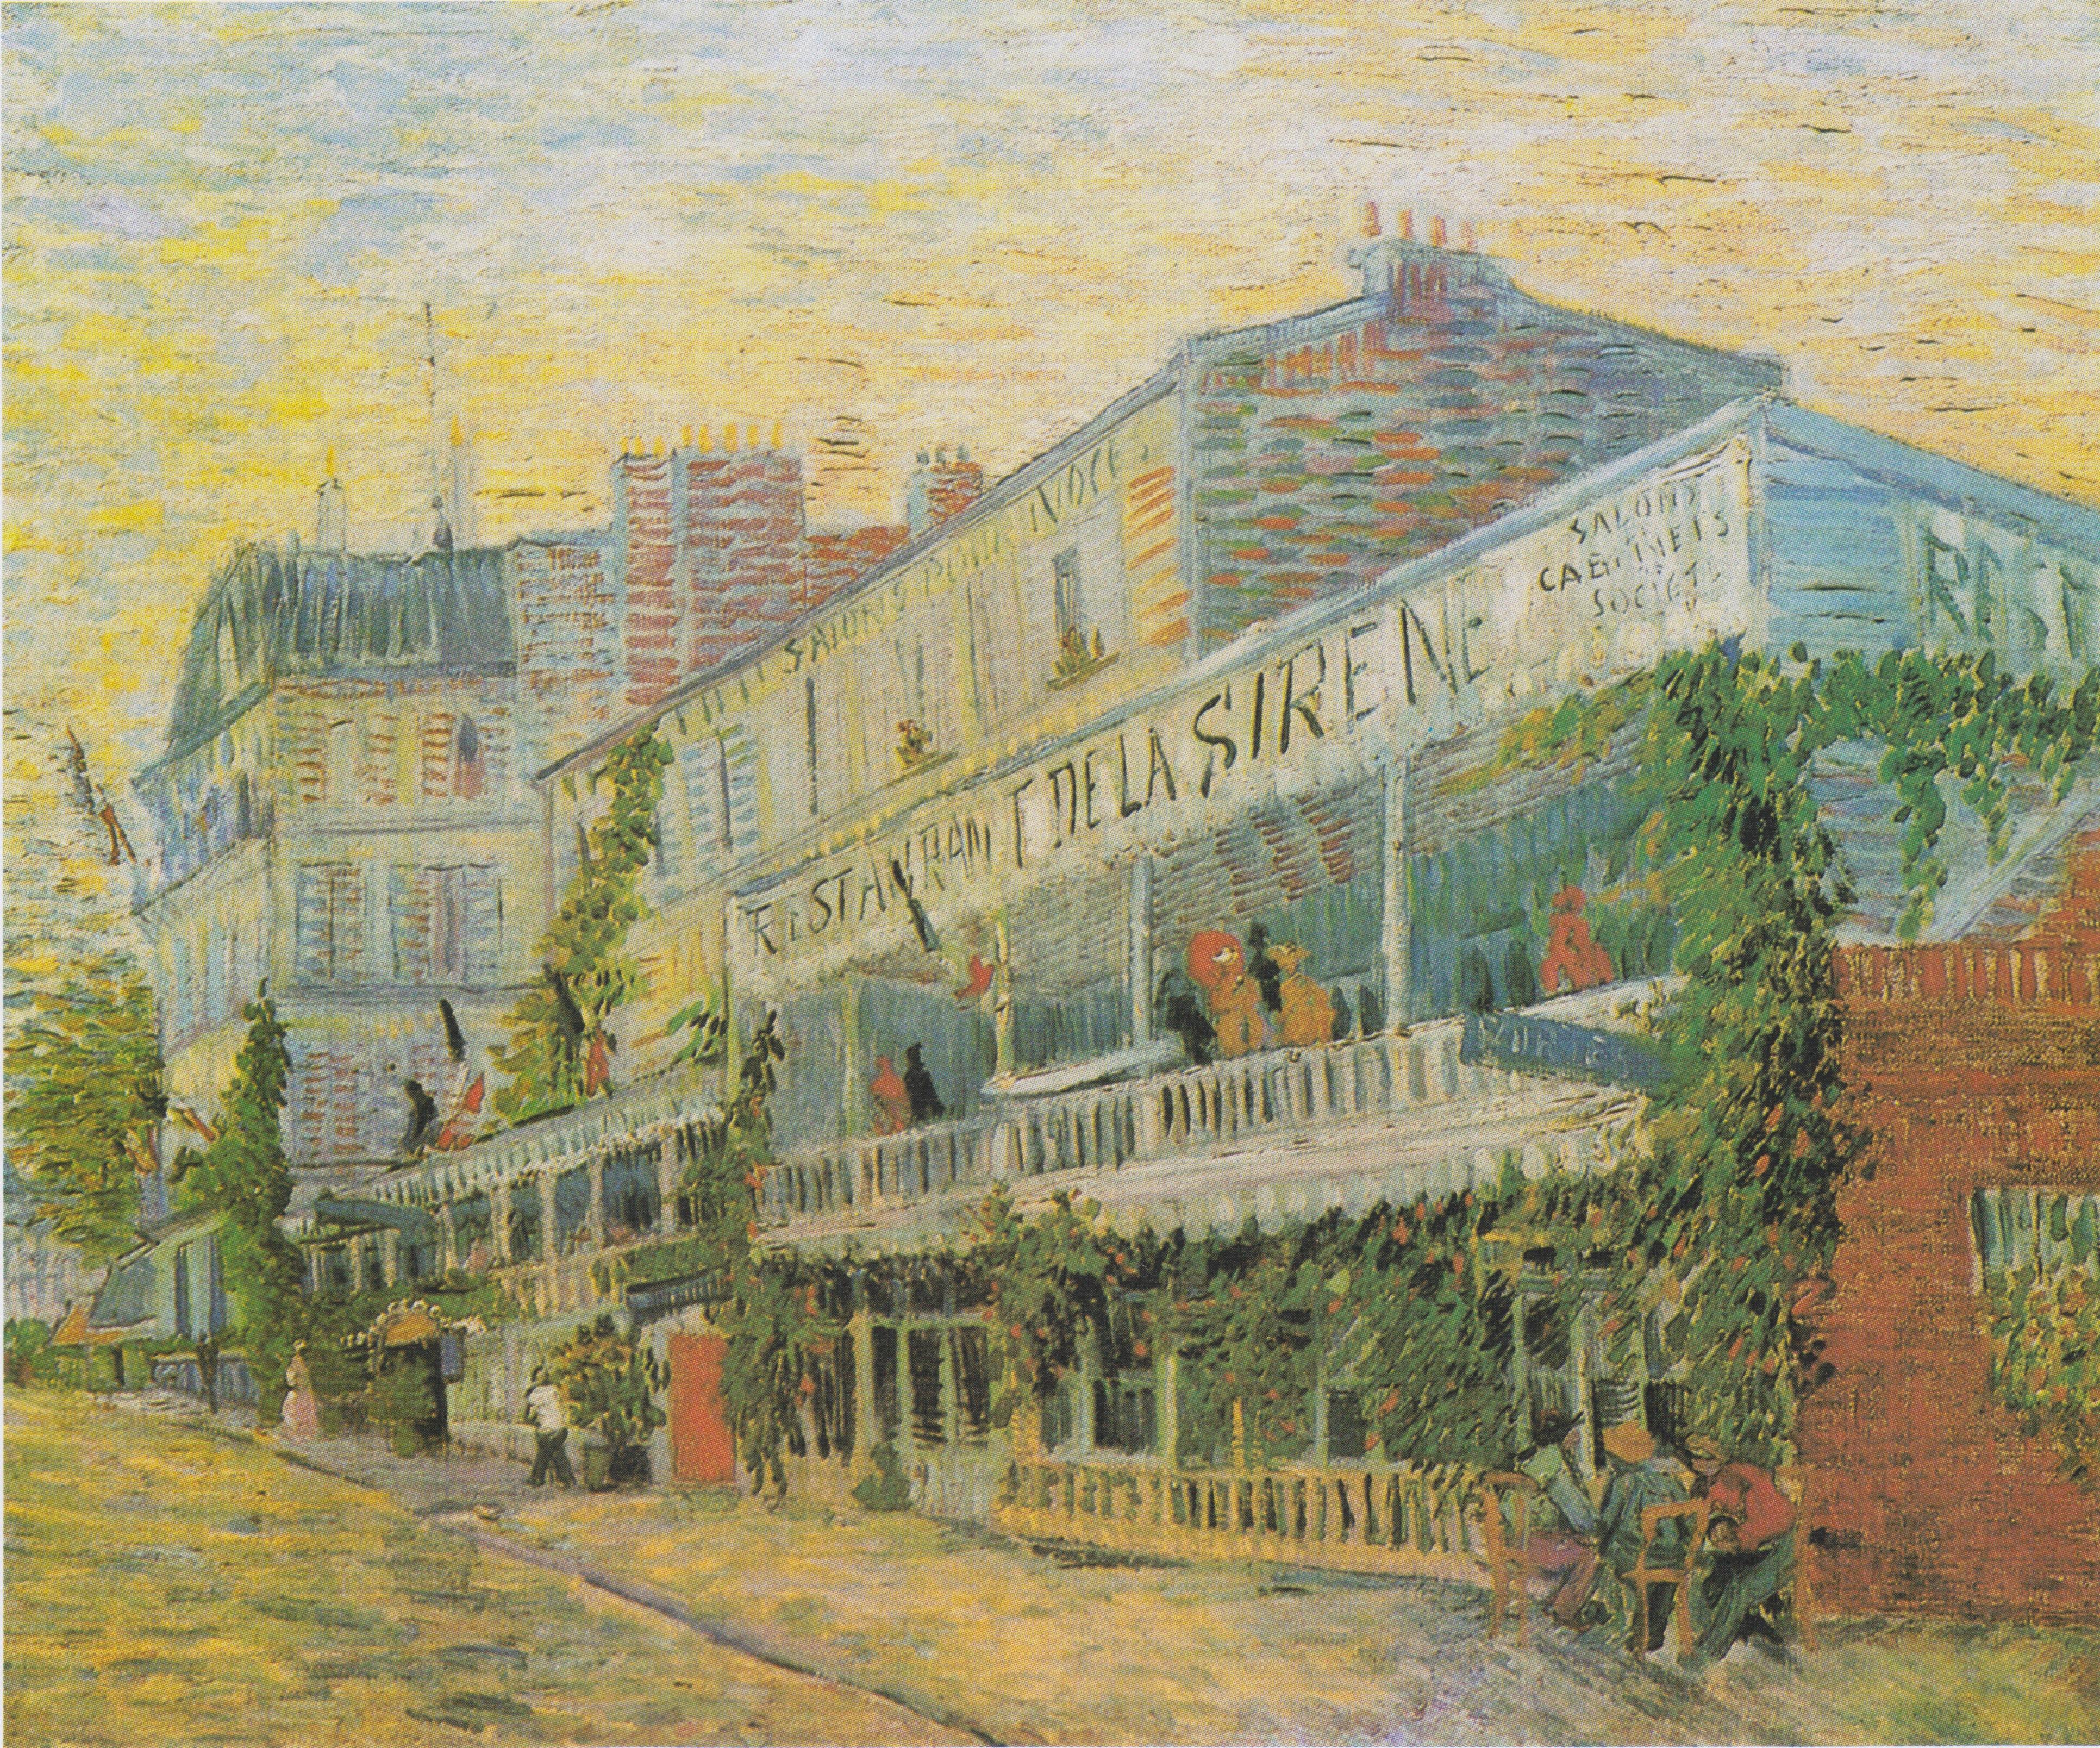 nike air max chaussures 2009 - Asni��res (Van Gogh series) - Wikipedia, the free encyclopedia